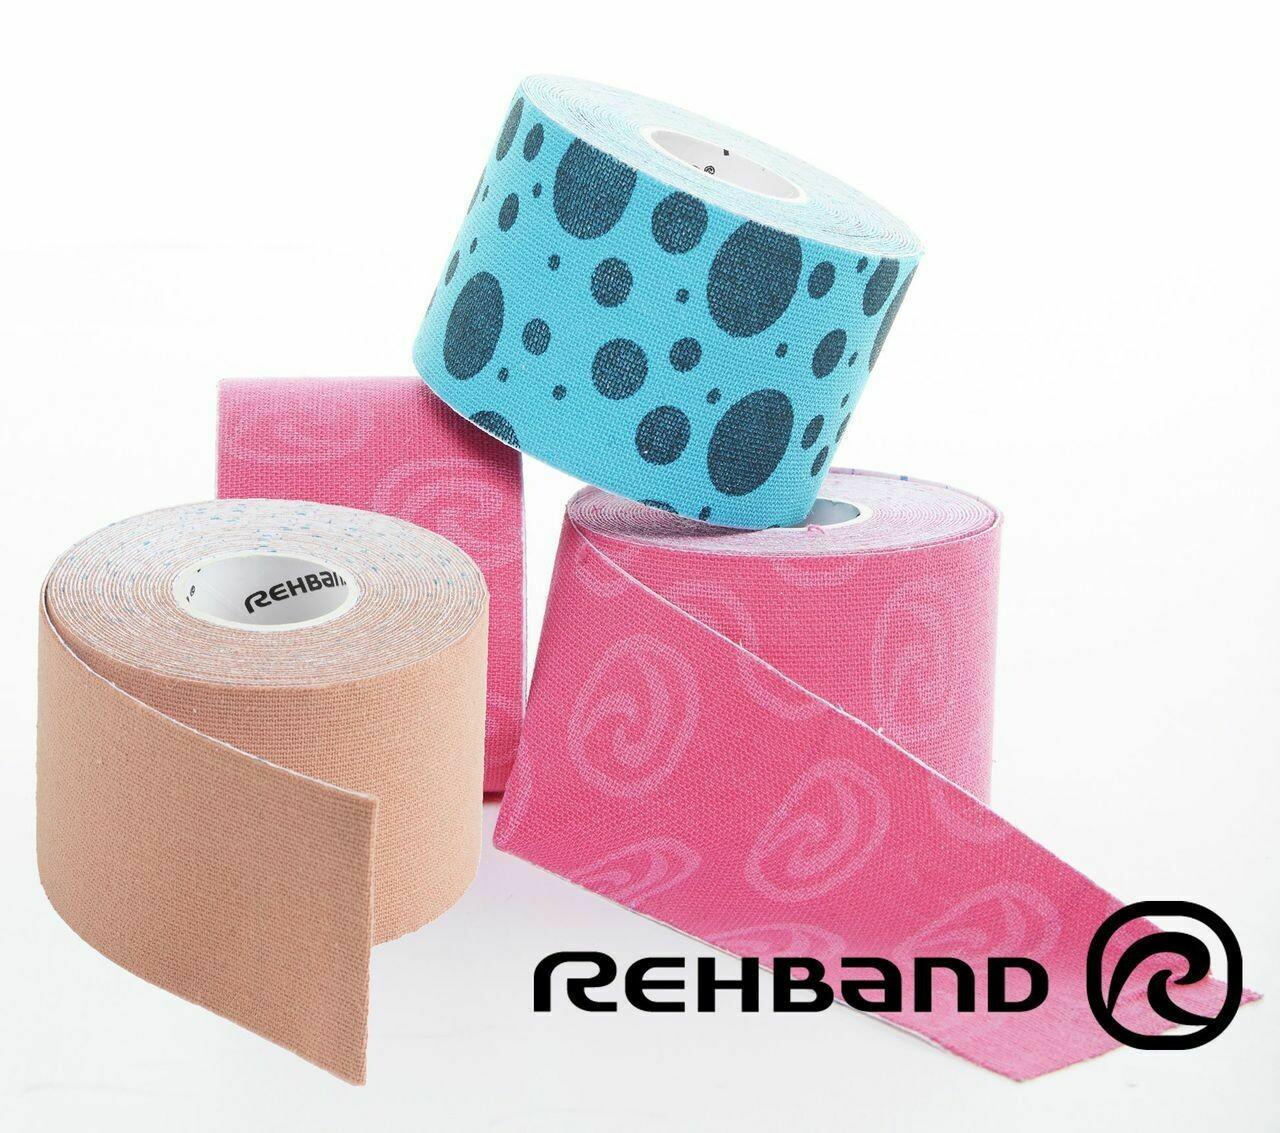 Rx Kinesiology Tape (16')